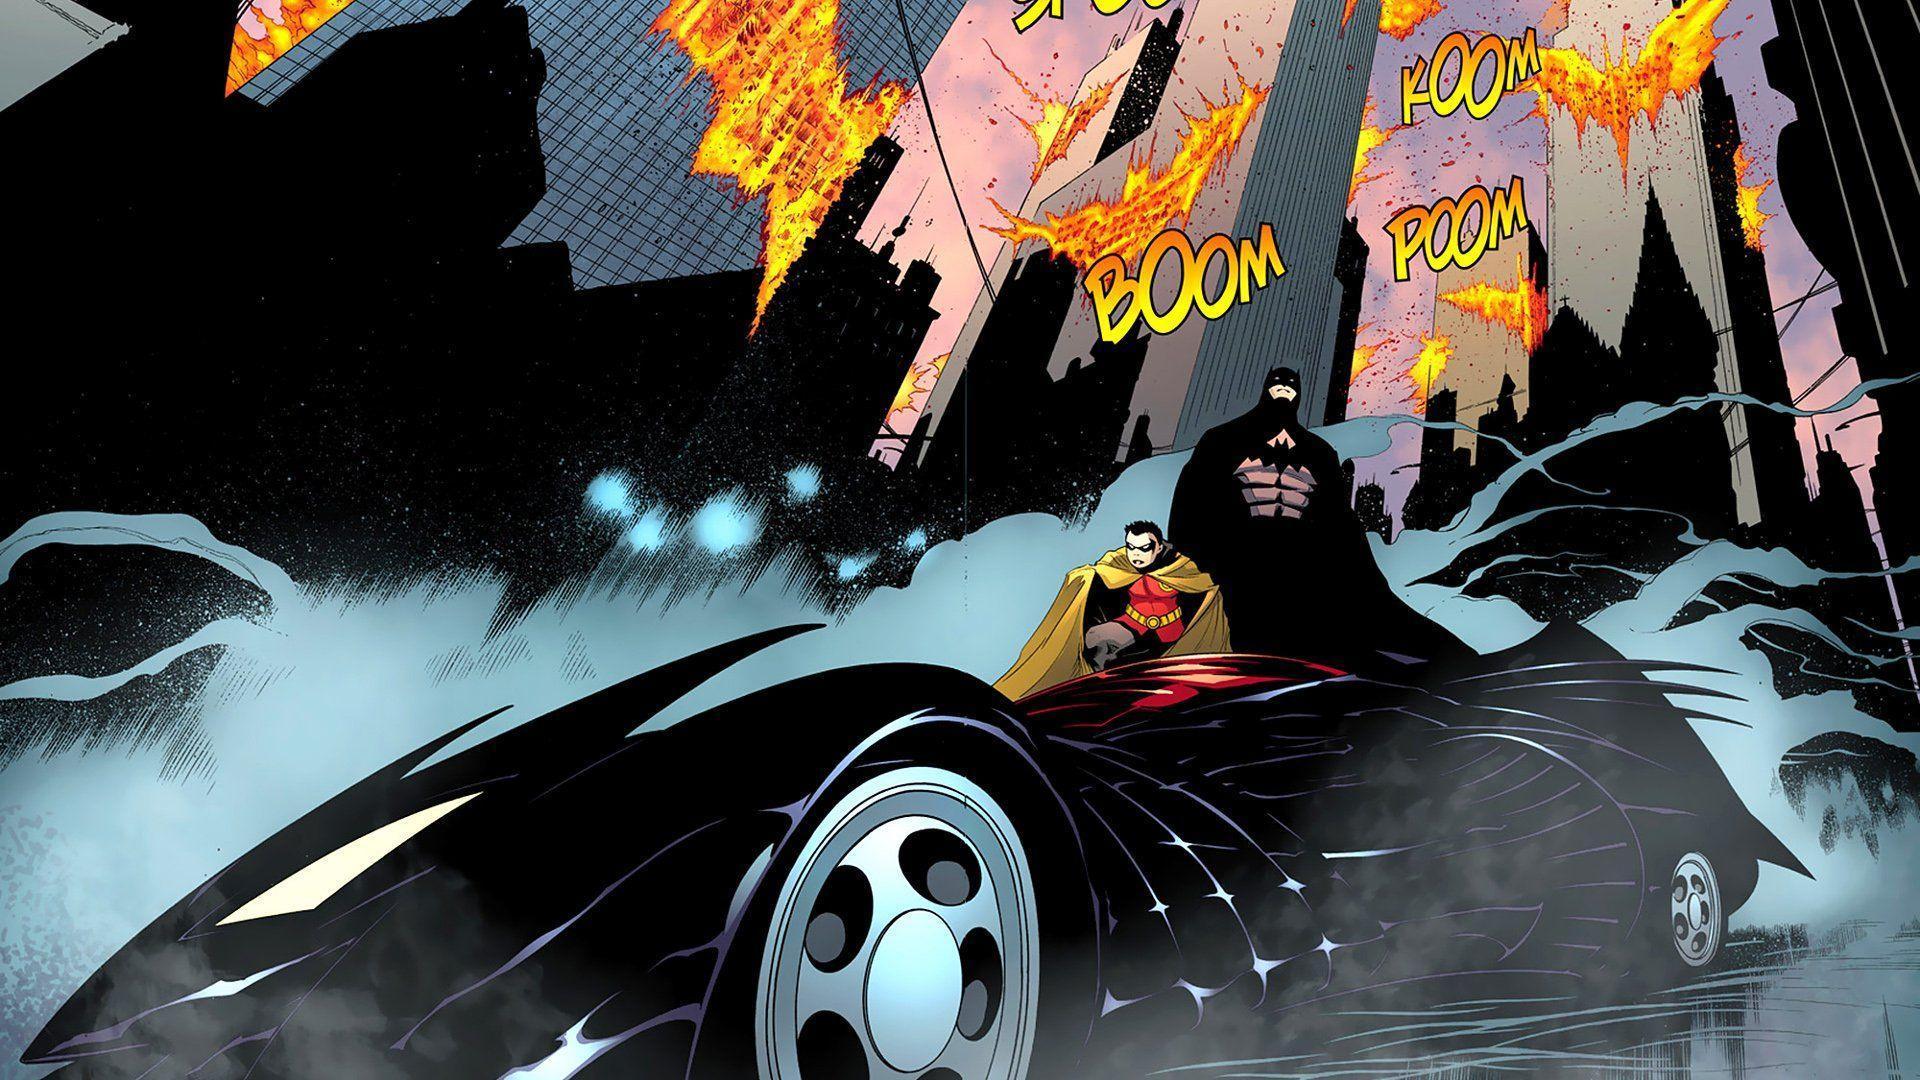 67 Batman & Robin HD Wallpapers | Backgrounds - Wallpaper Abyss